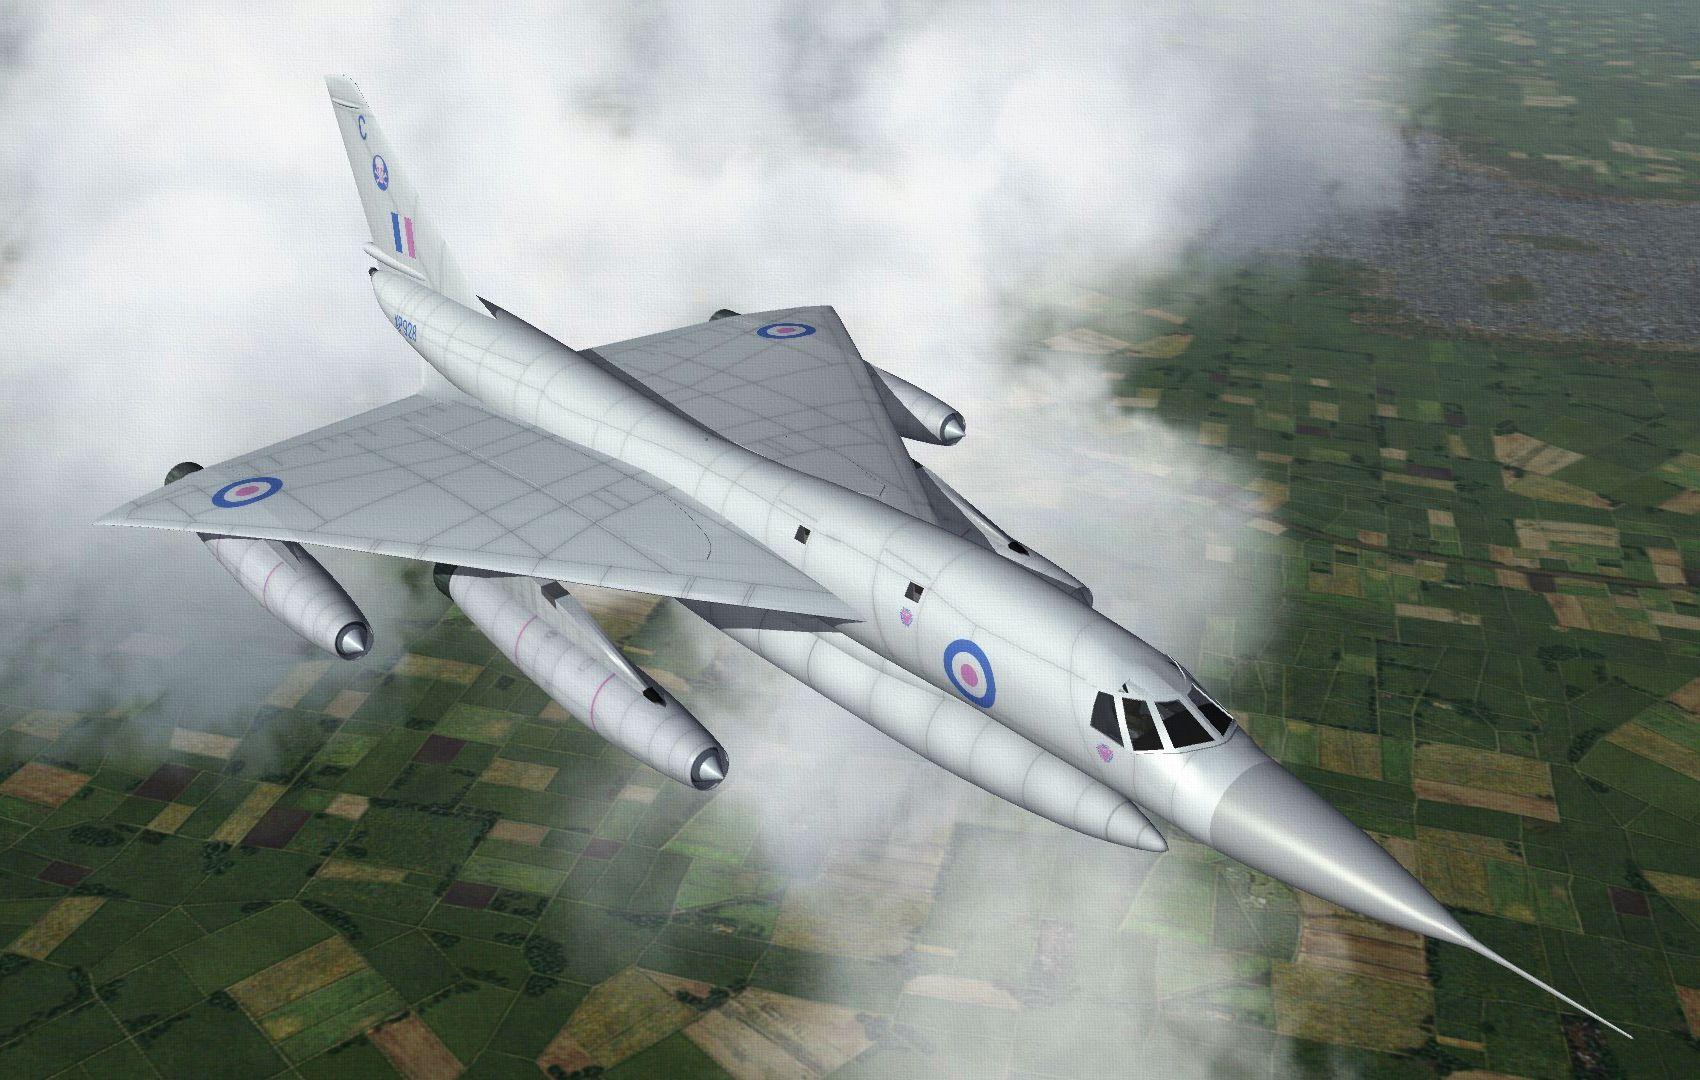 RAF%20HUSTLER%20B1.07_zpsvhhohb0b.jpg